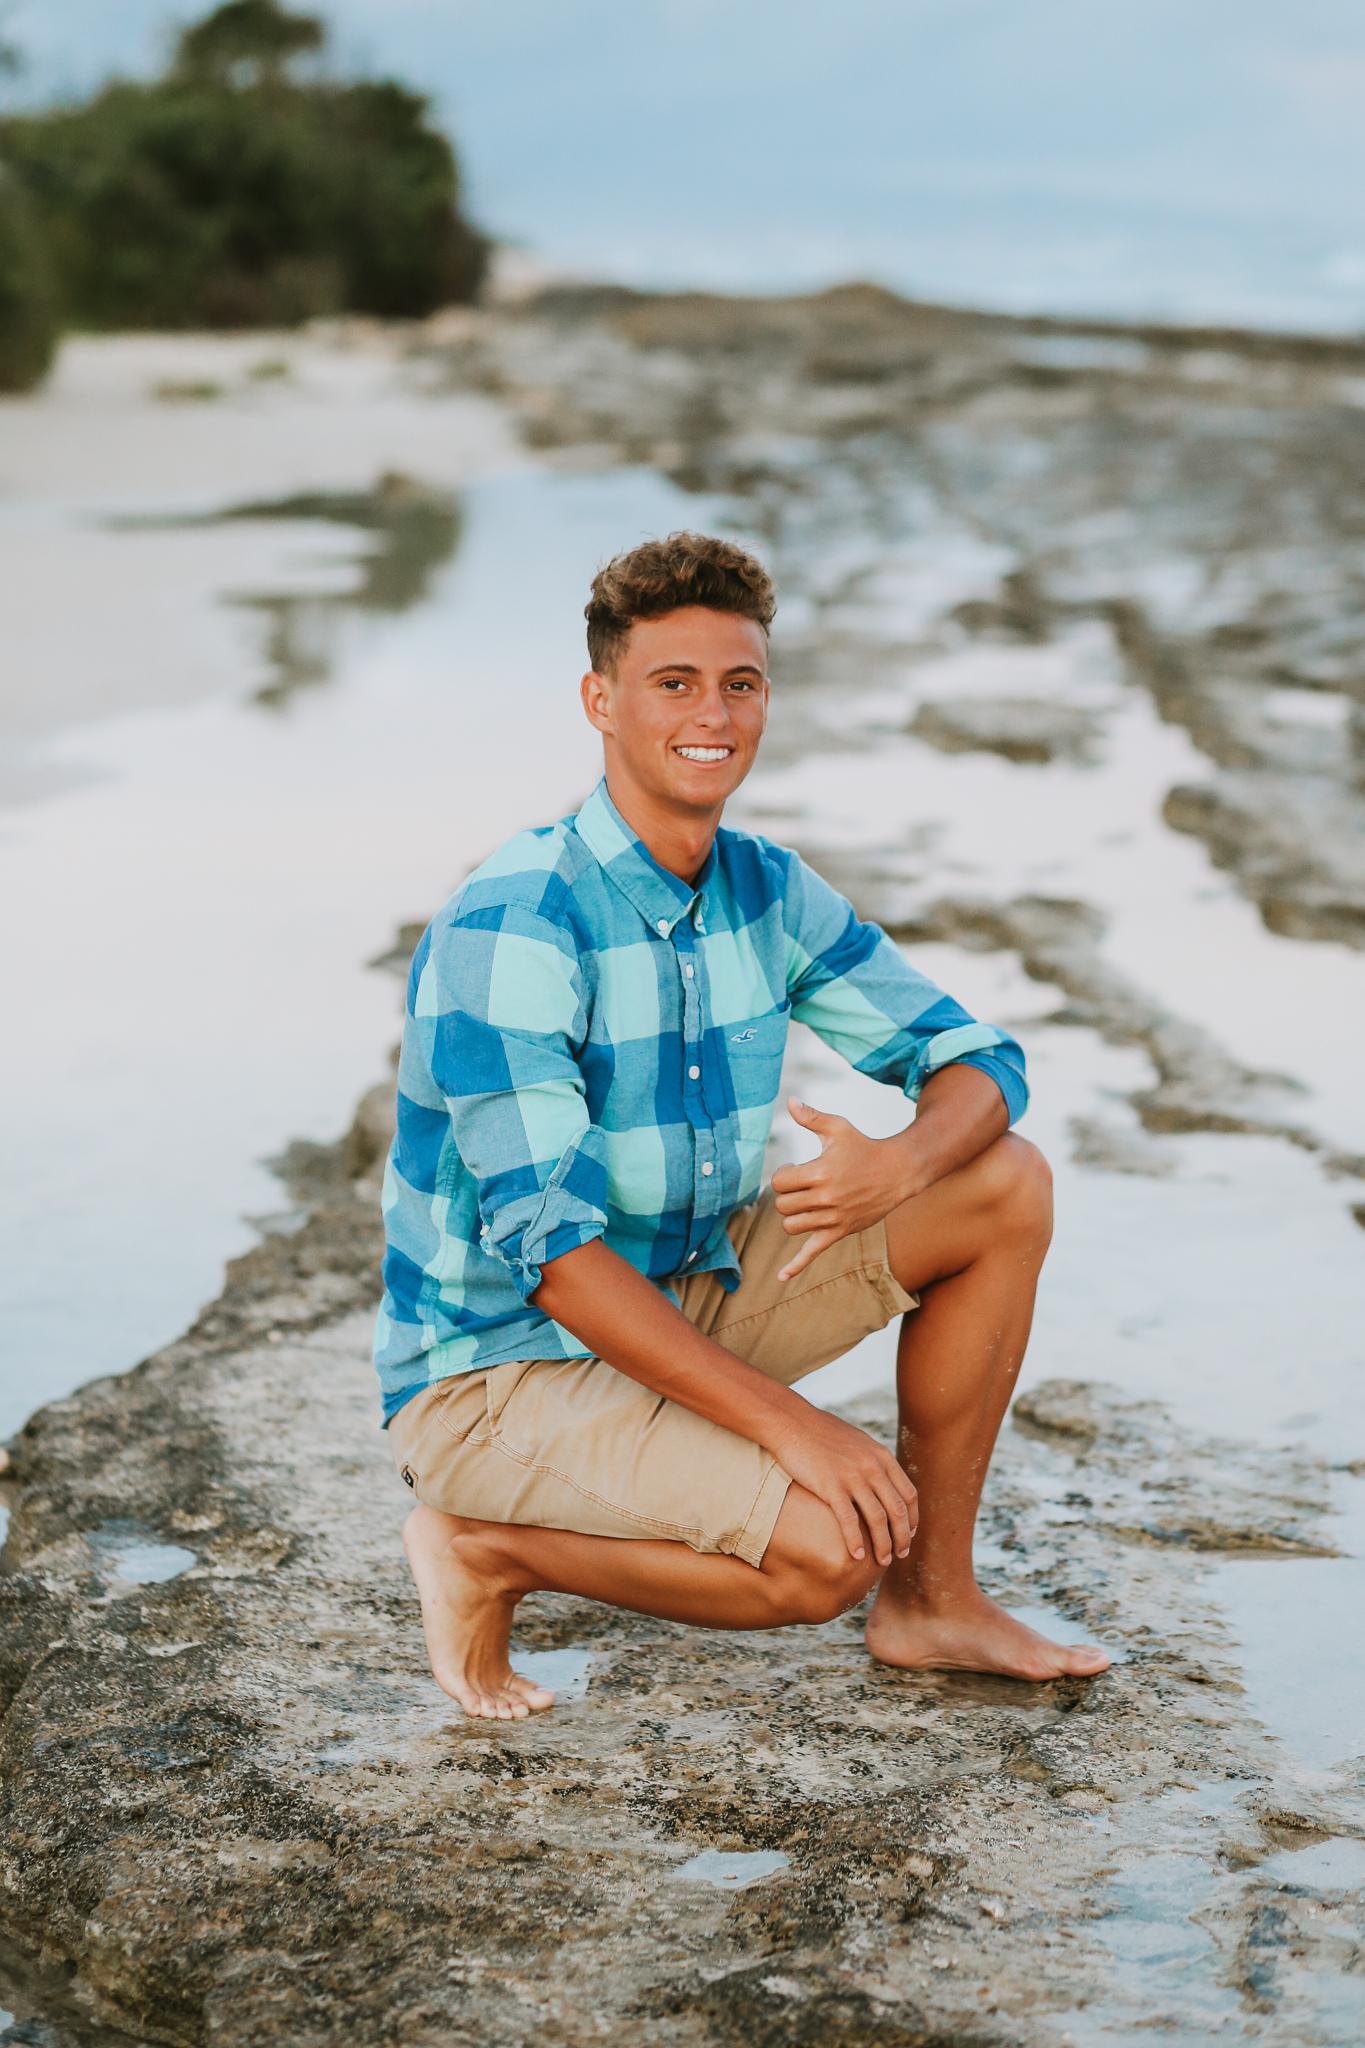 IG, senior, senior photos in hawaii, hawaii photographer, photos of hawaii, hawaii portraits, aulani, disney aulani, vacation photographer, destination photographer, hawaii,  8July 20, 2018.jpg